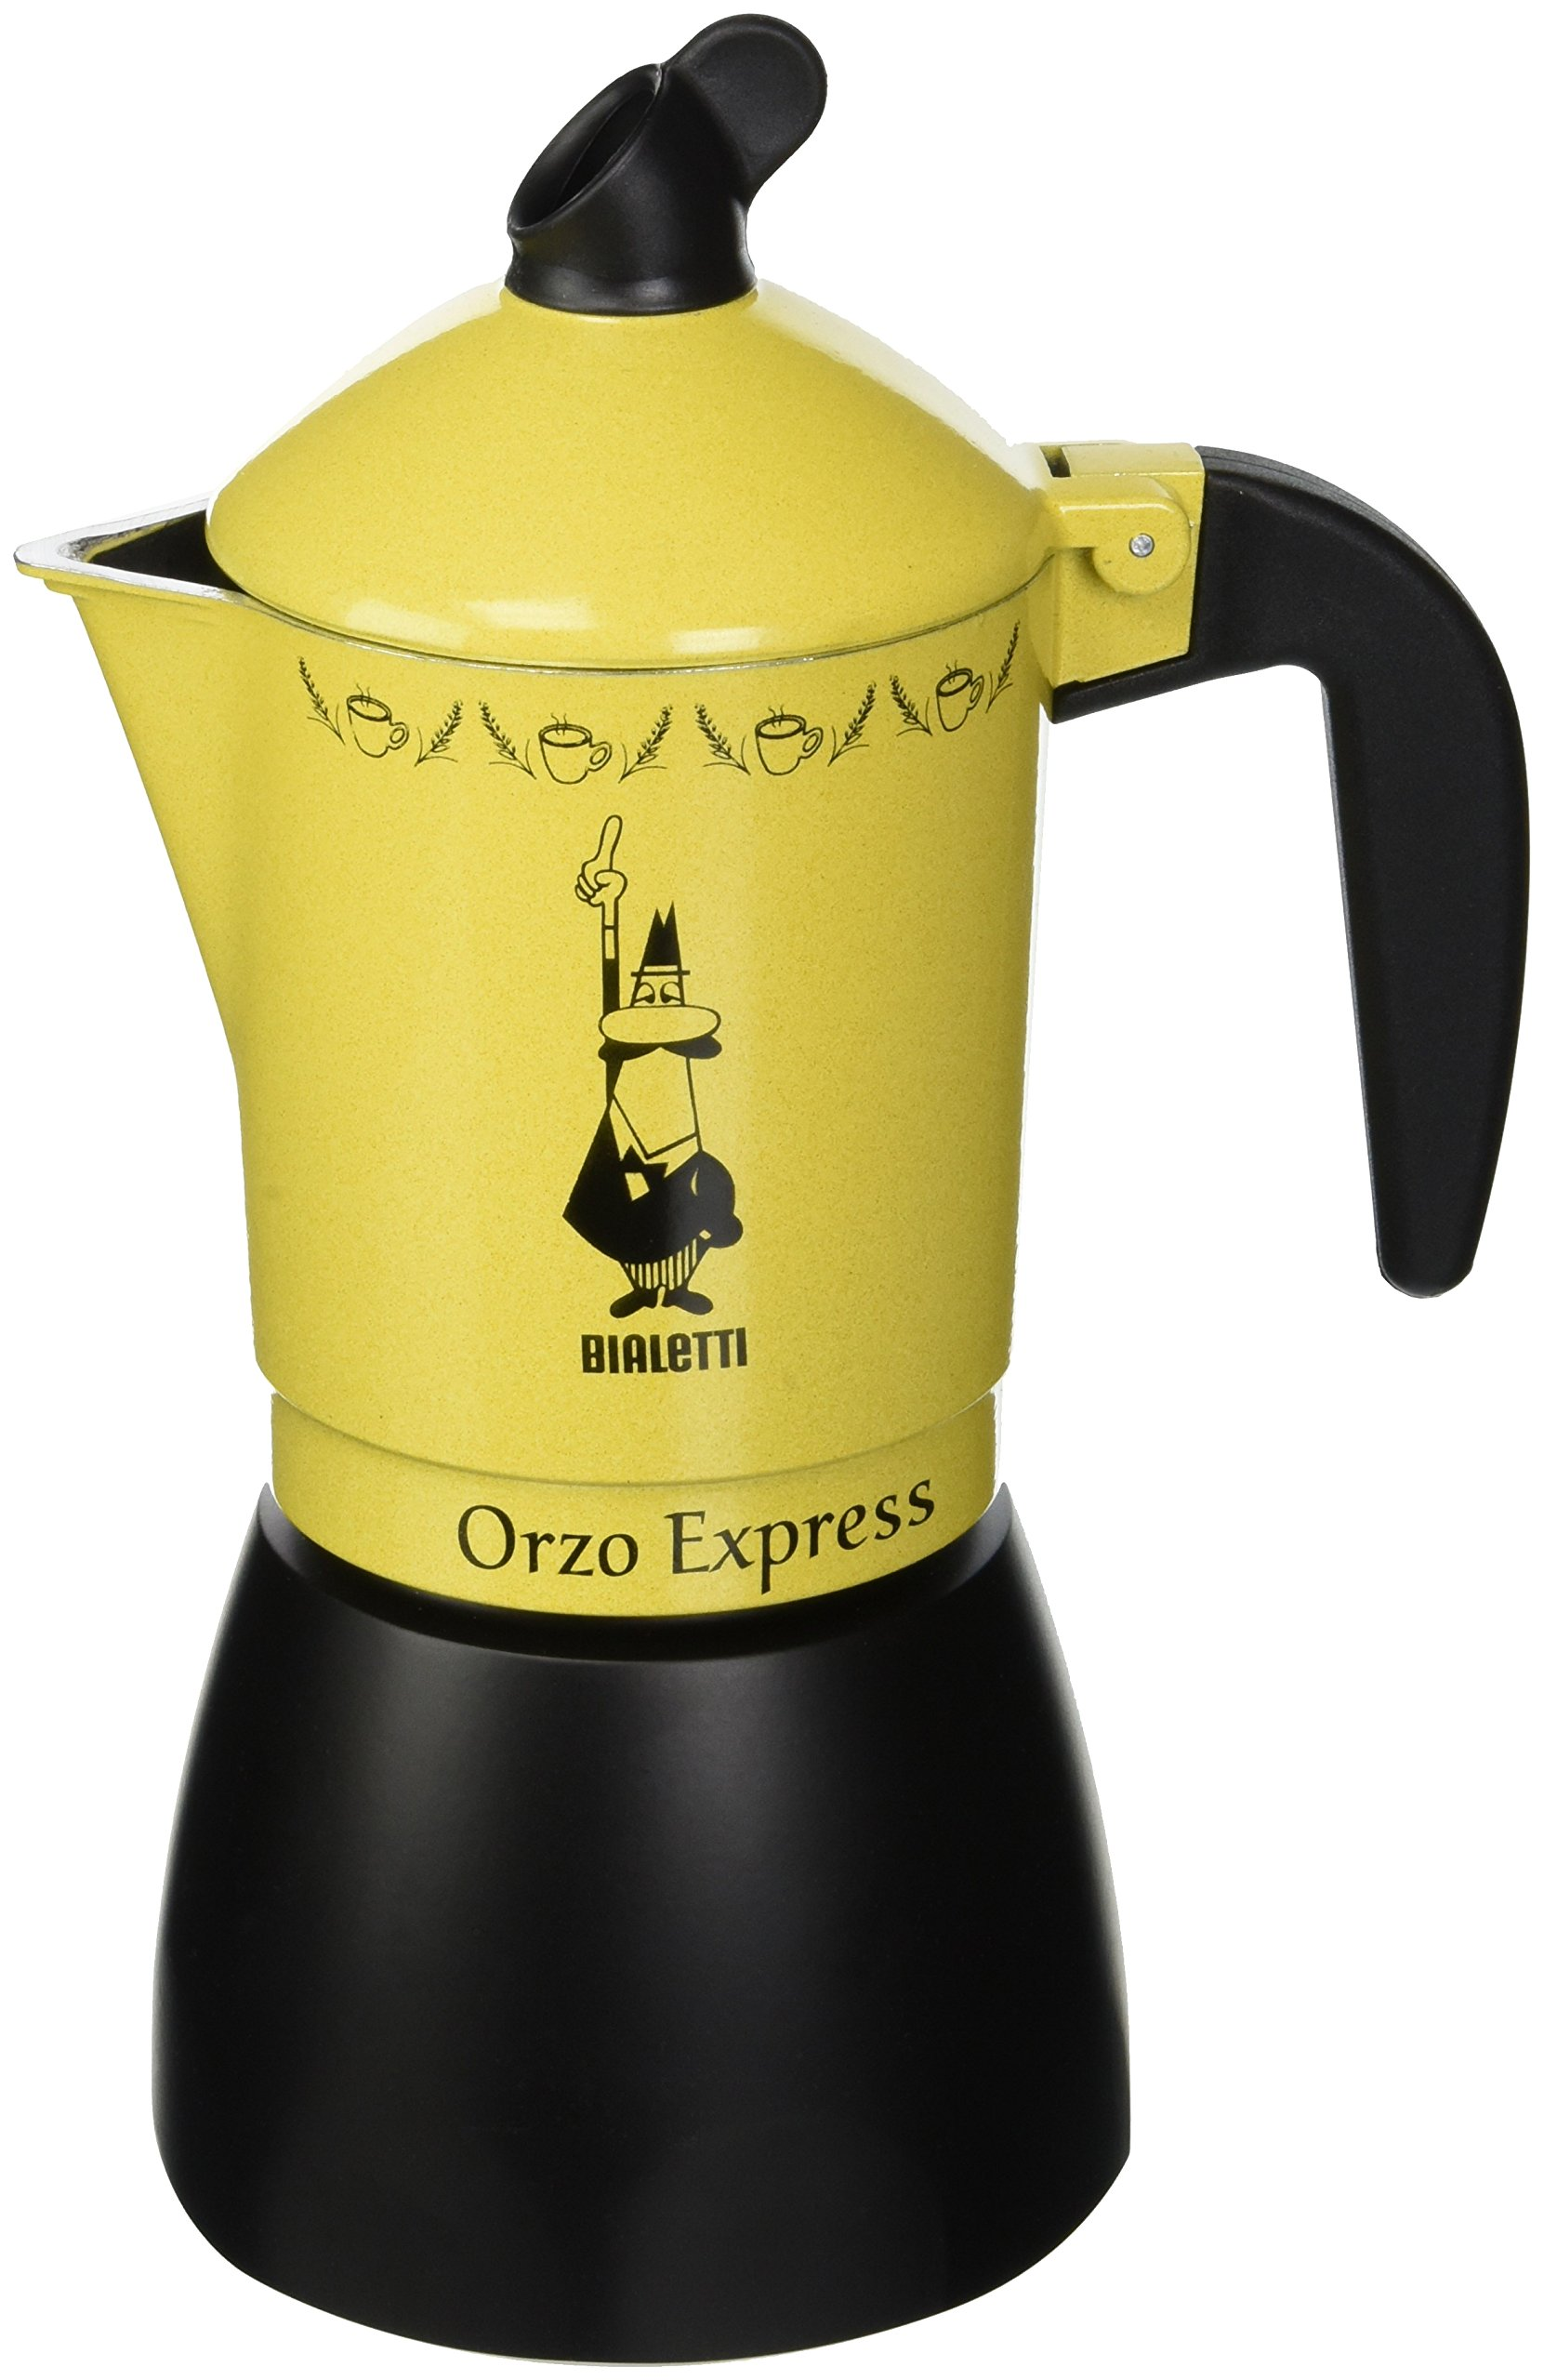 Bialetti 4 cups Orzo Express